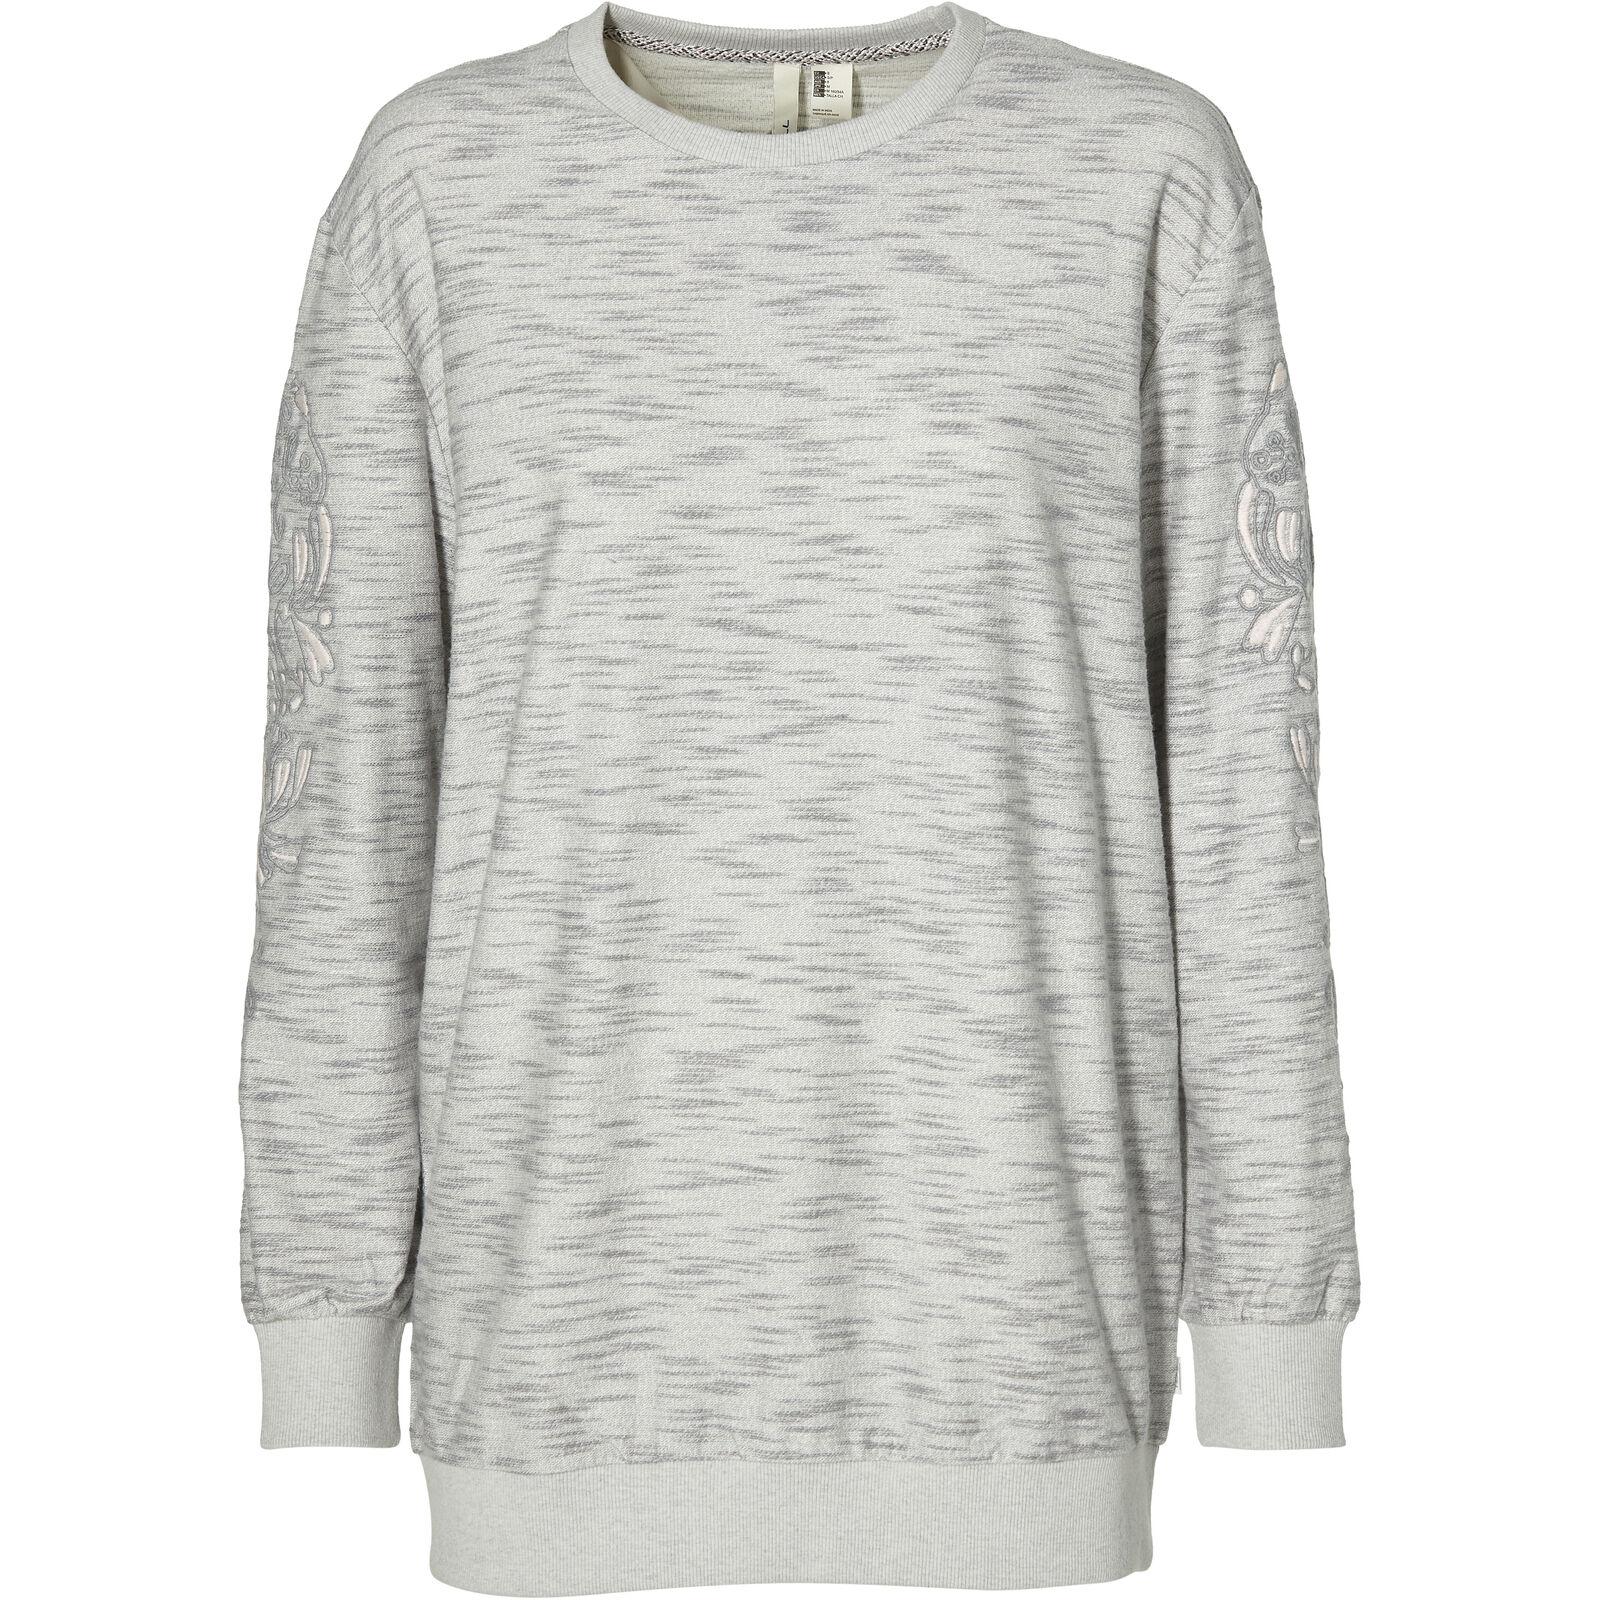 O'Neill Sweatshirt Sweater Sugar Pine Print Crew Sweat hellgrey